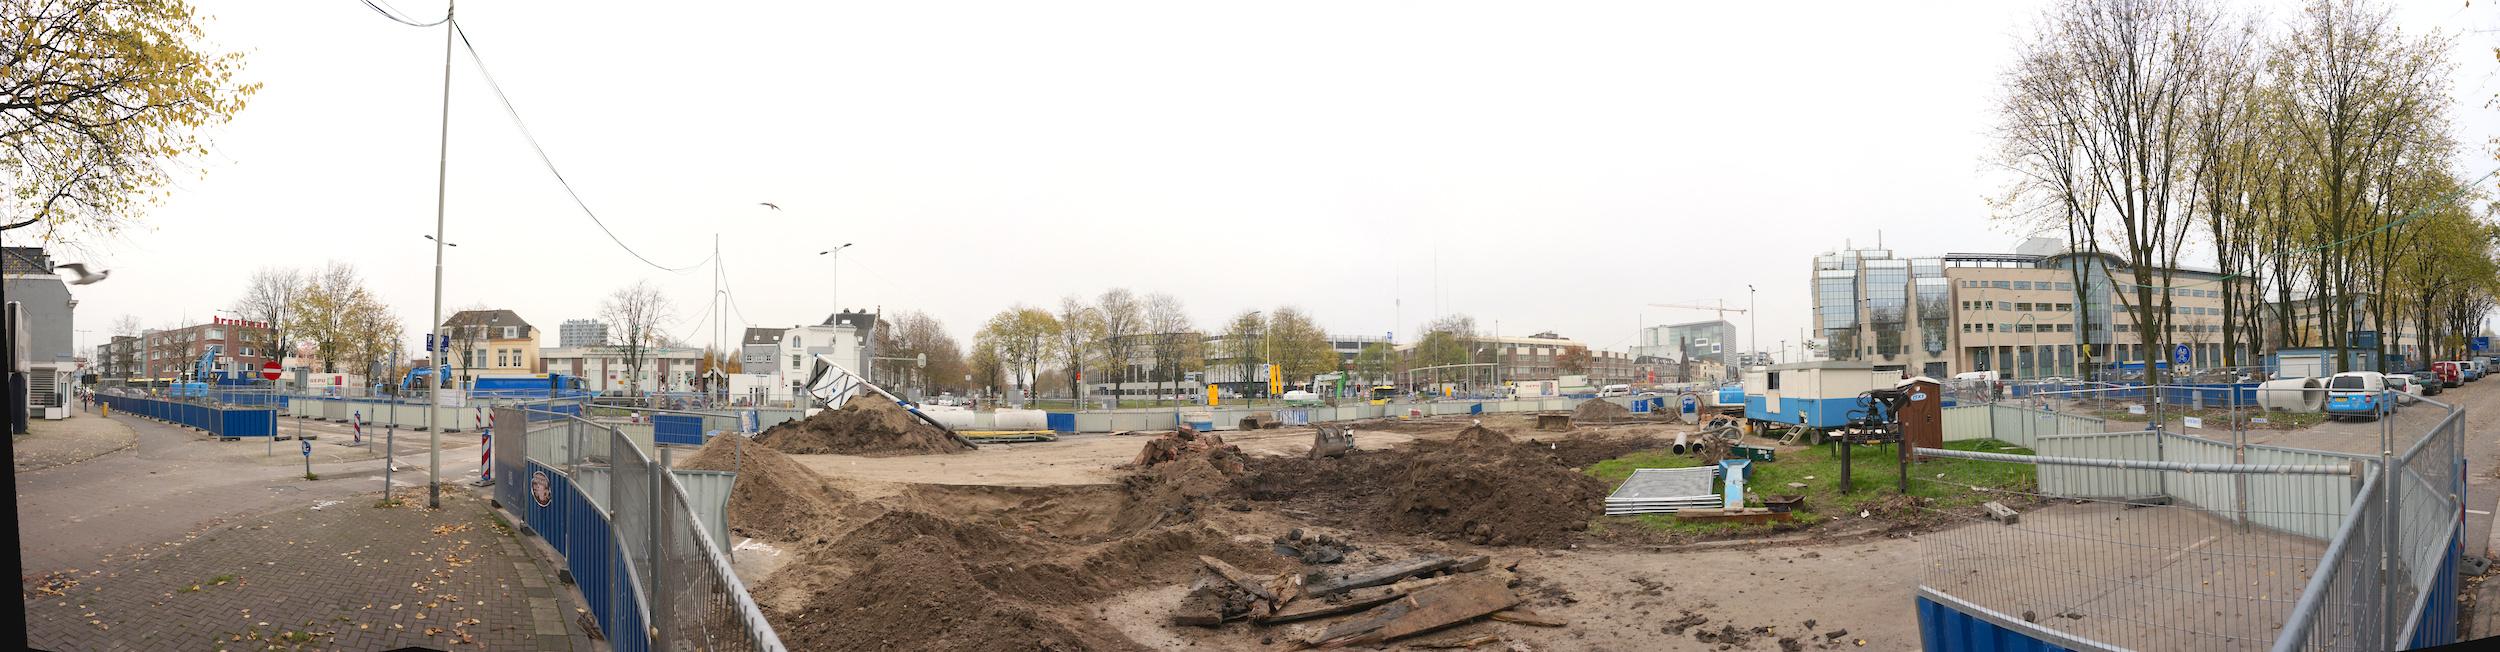 Panorama bouwplaats Paardenveld